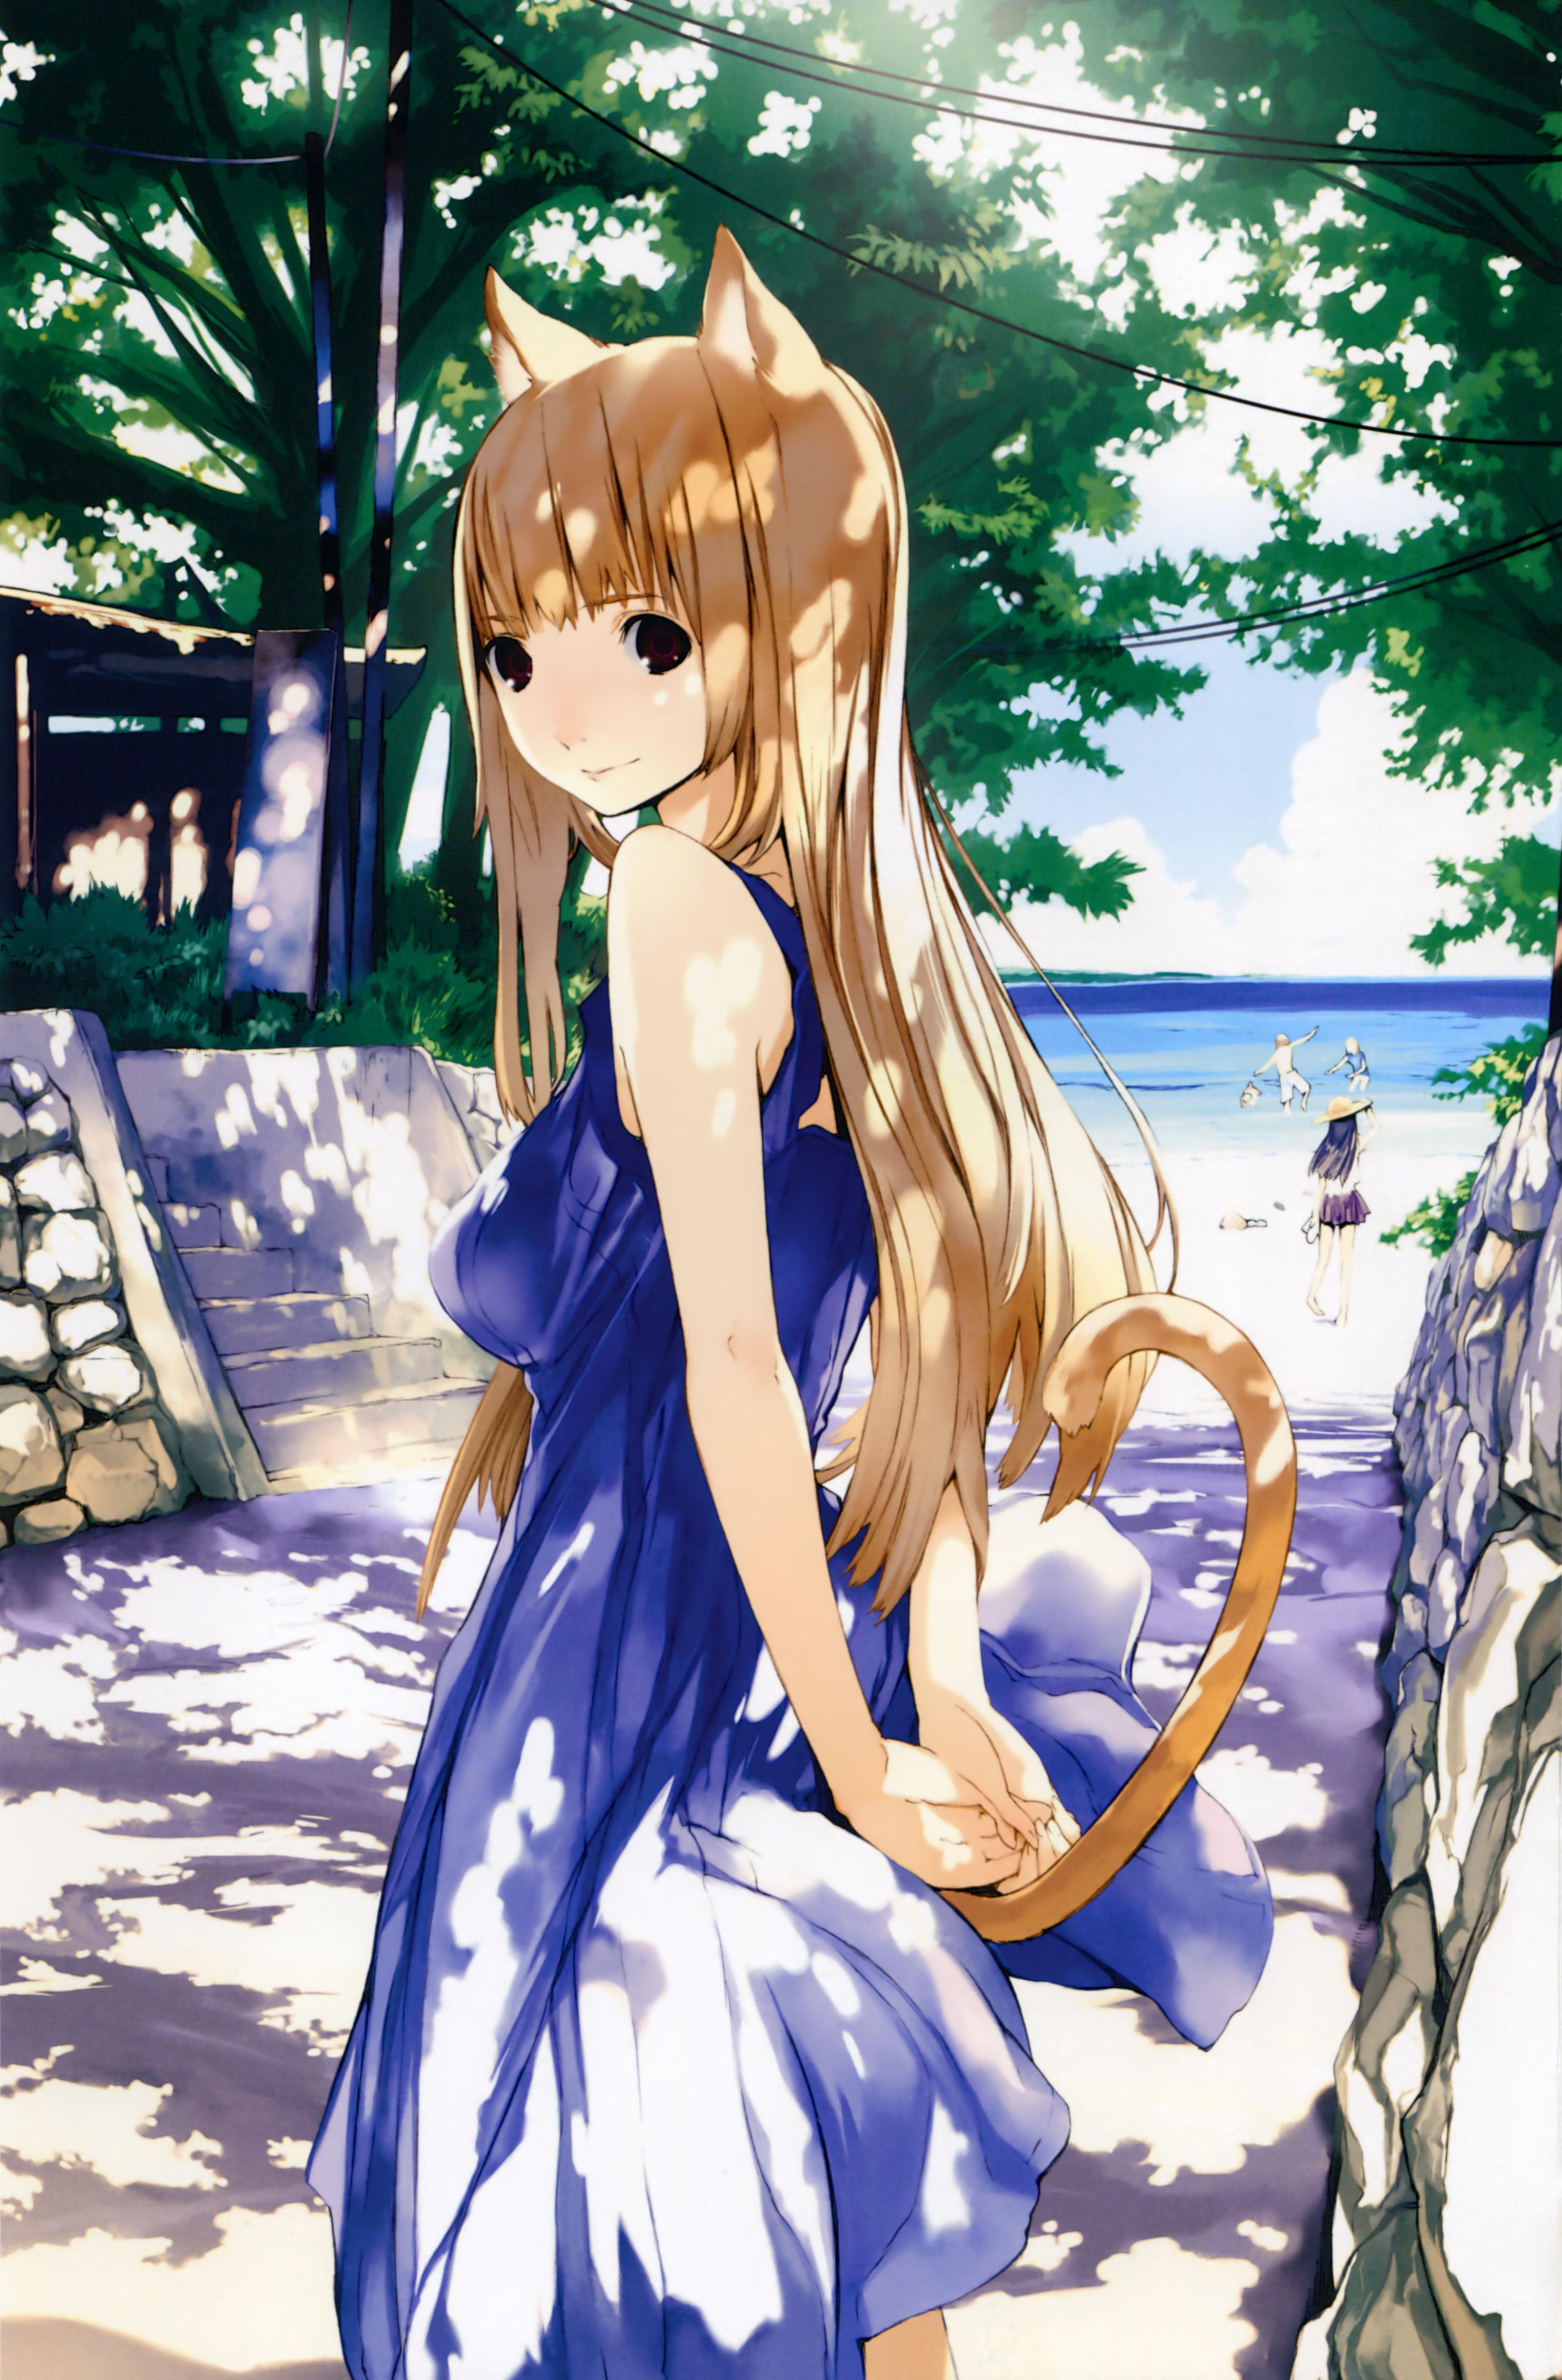 Eris Asobi Ni Iku Yo Zerochan Anime Image Board